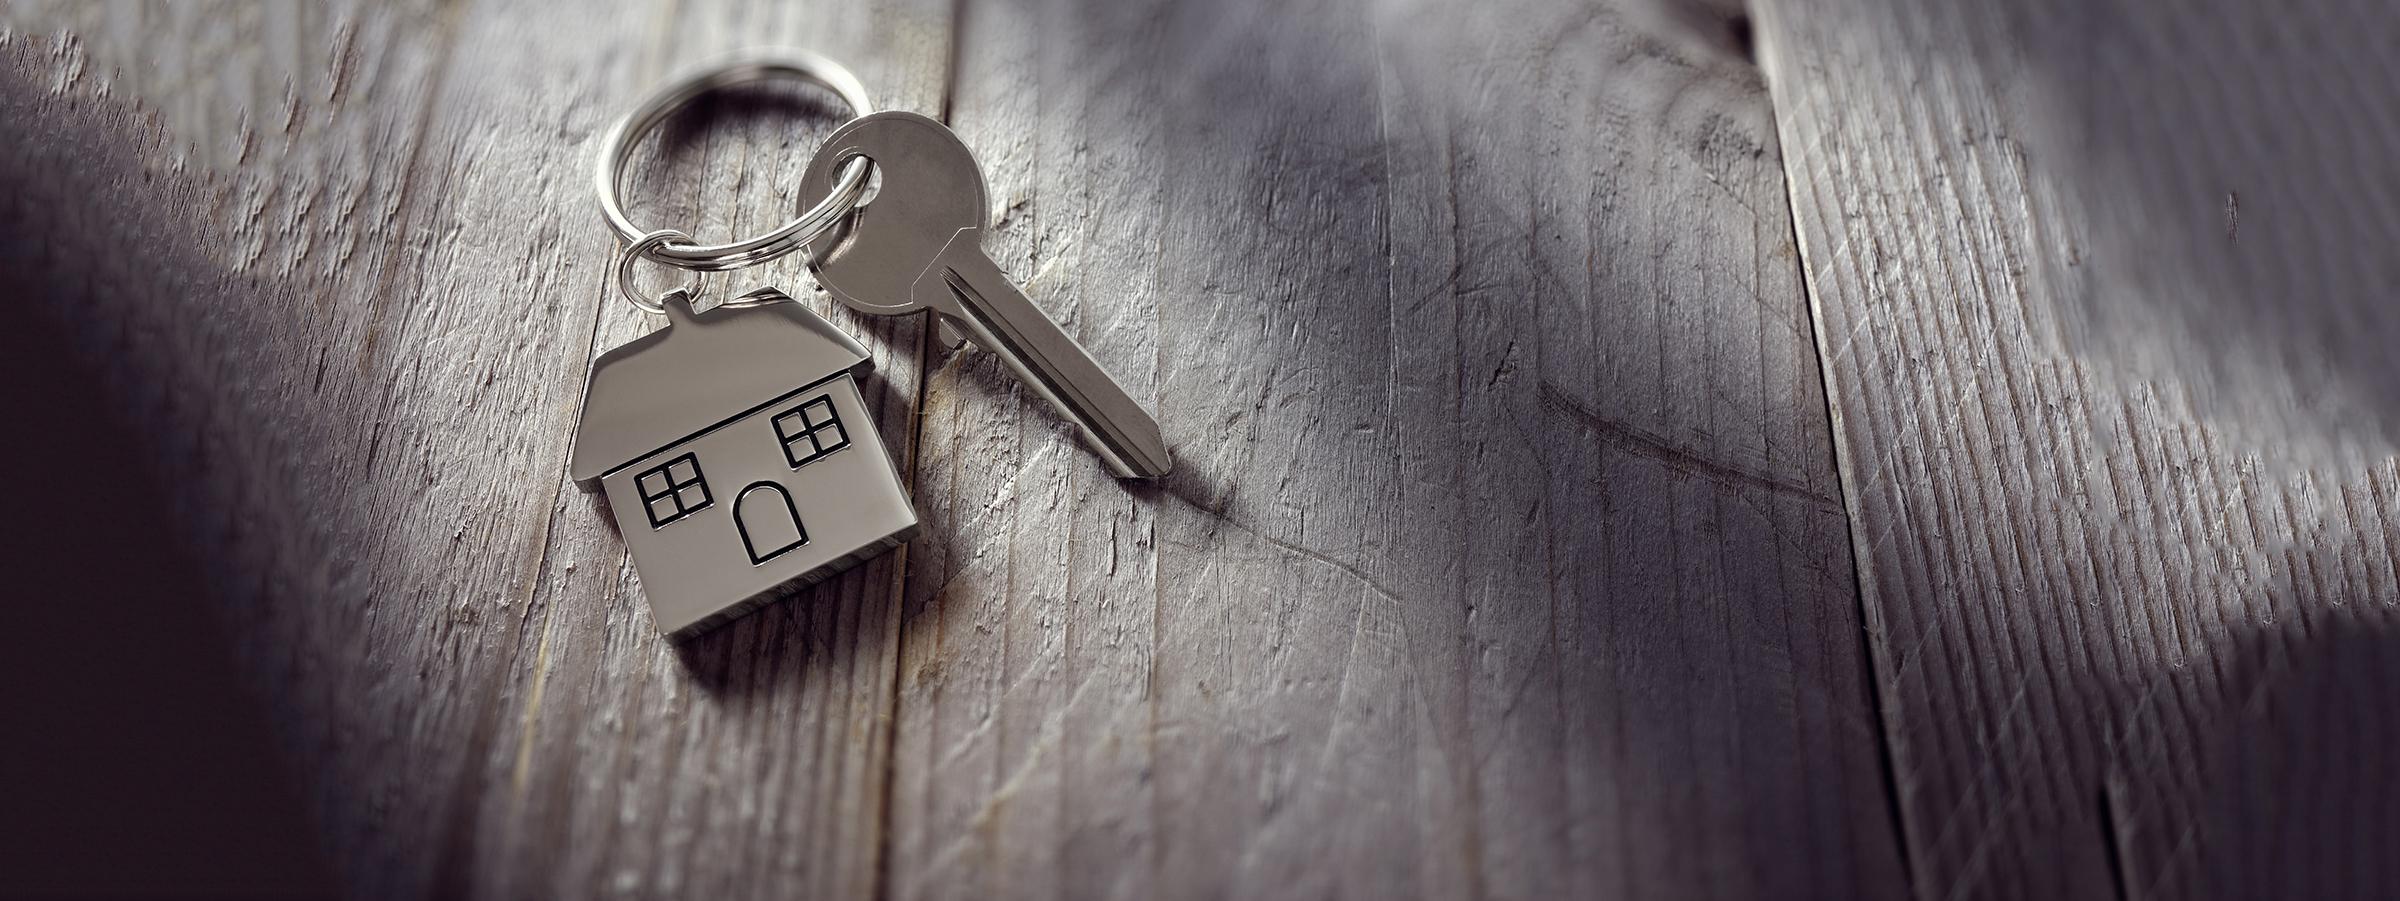 Katie Homes Landlords